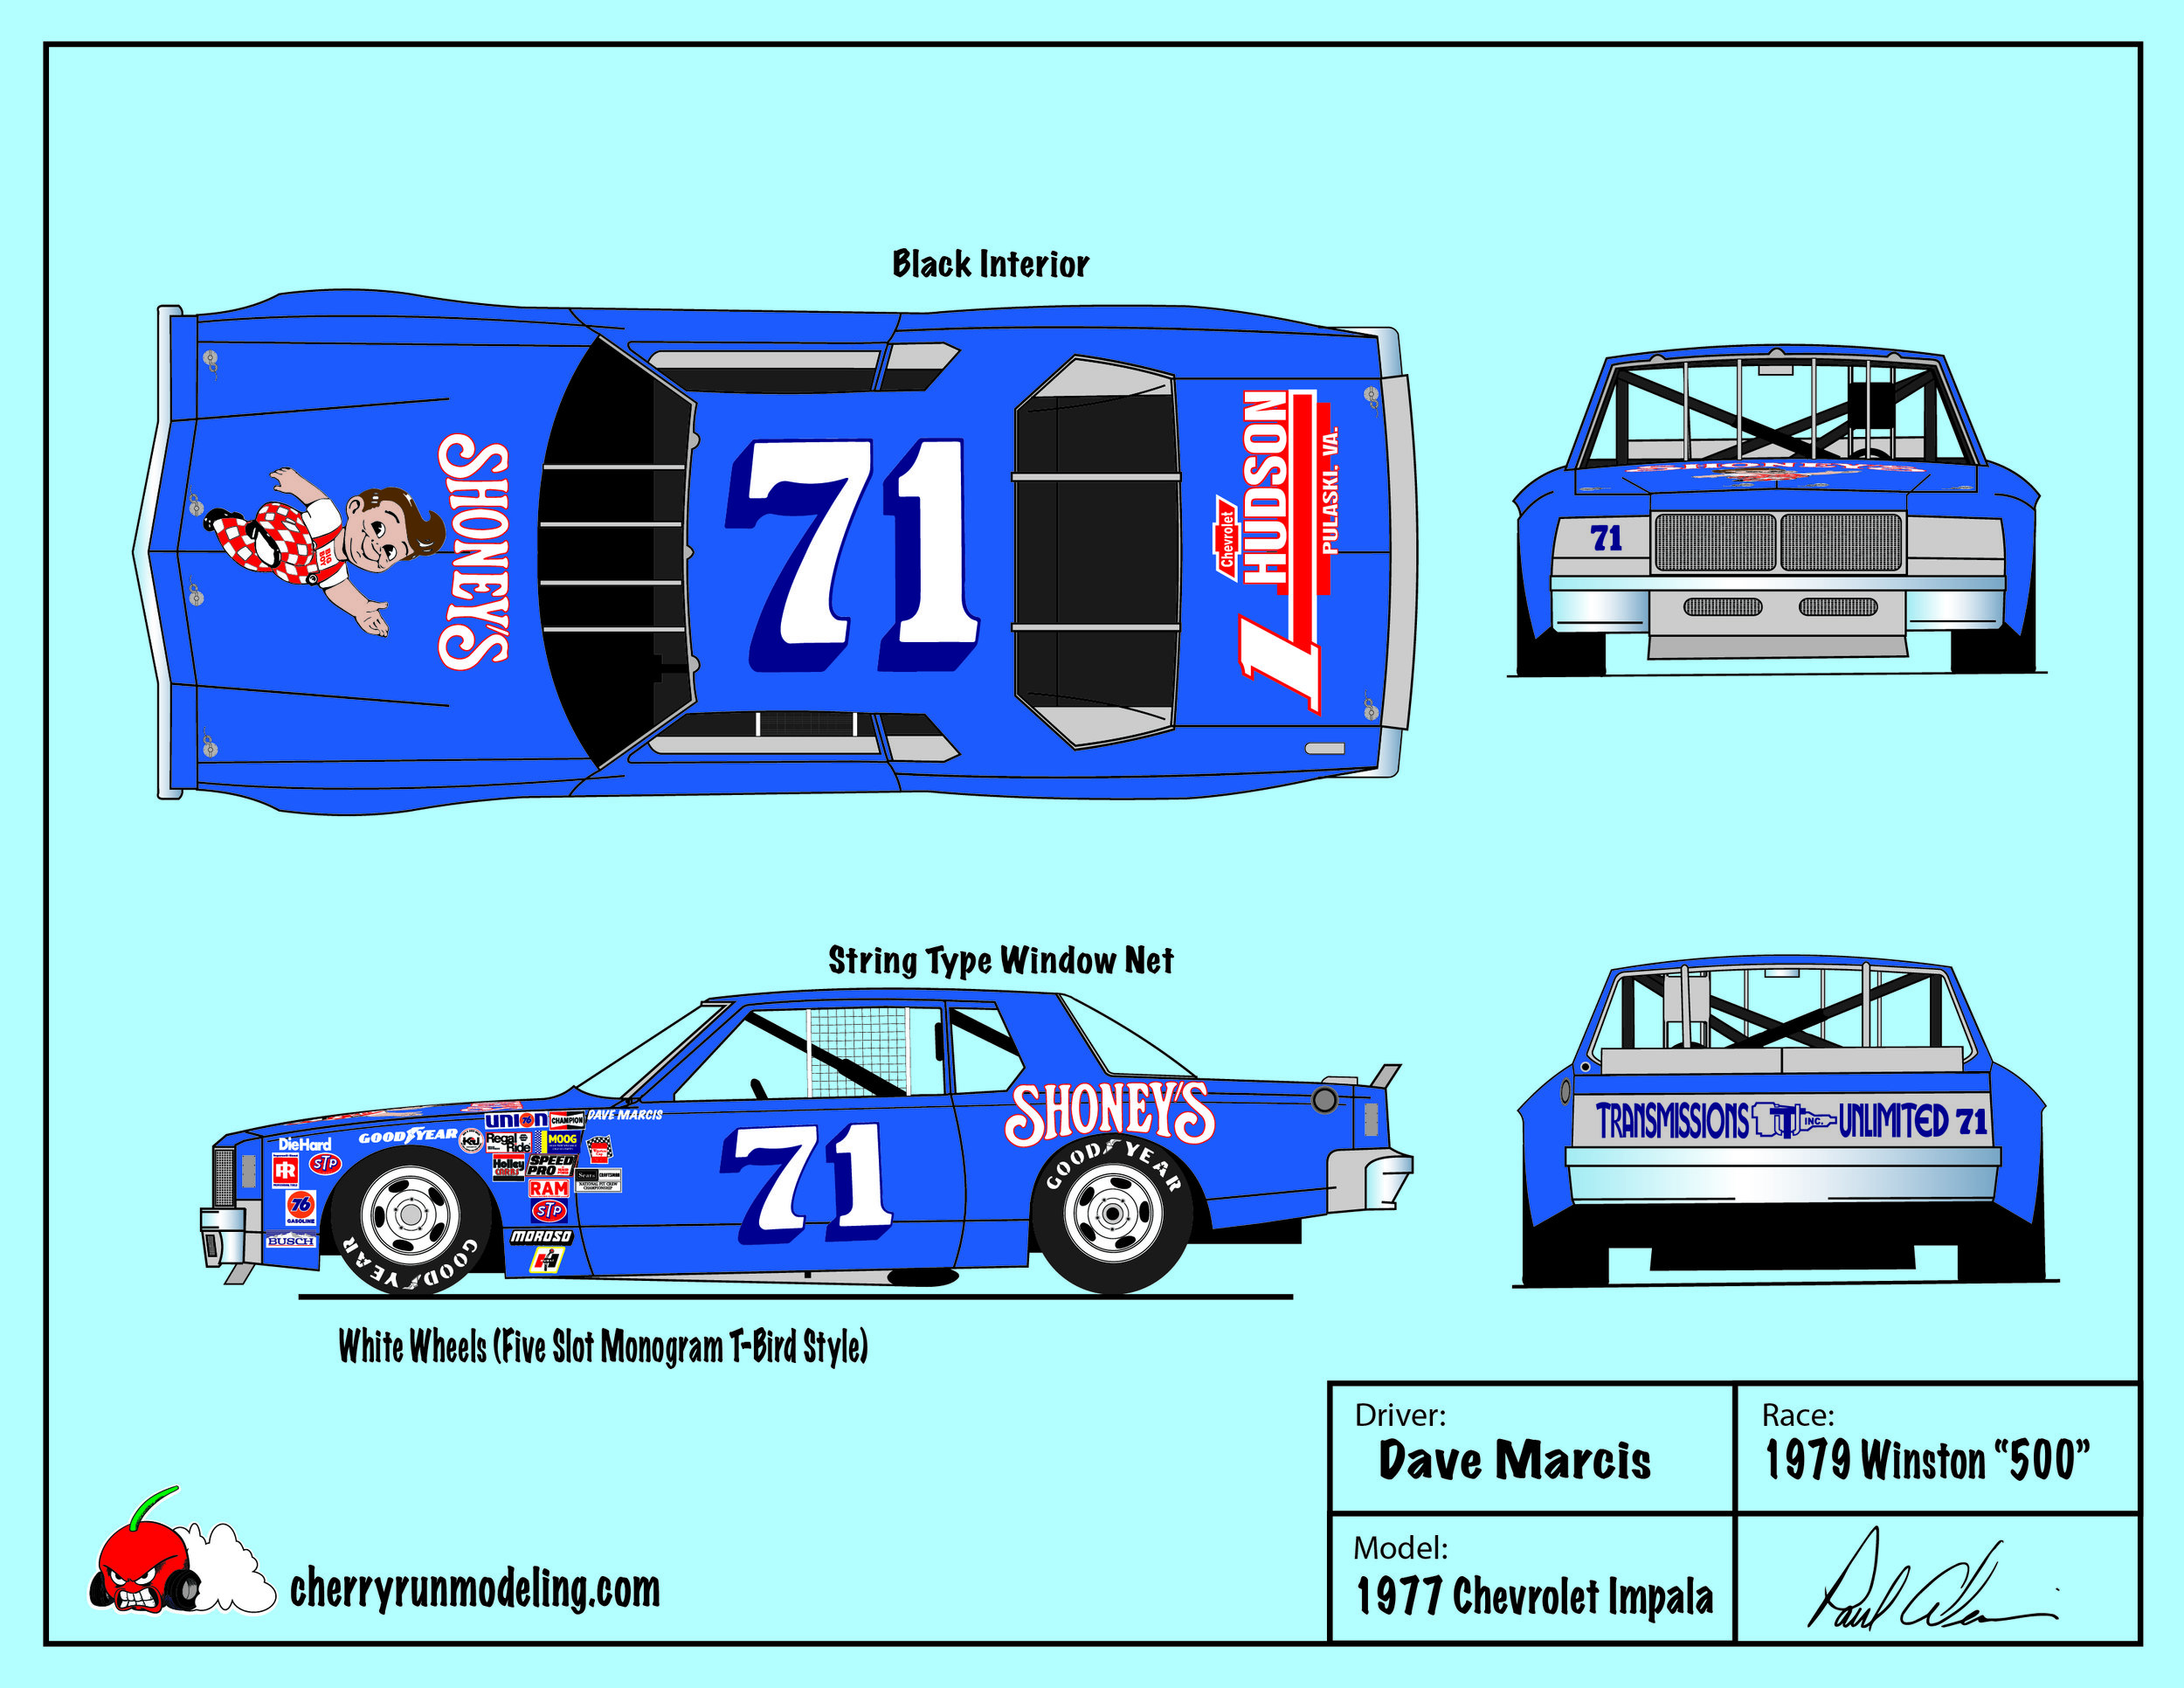 Dave Marcis 1979 Winston 500.jpg